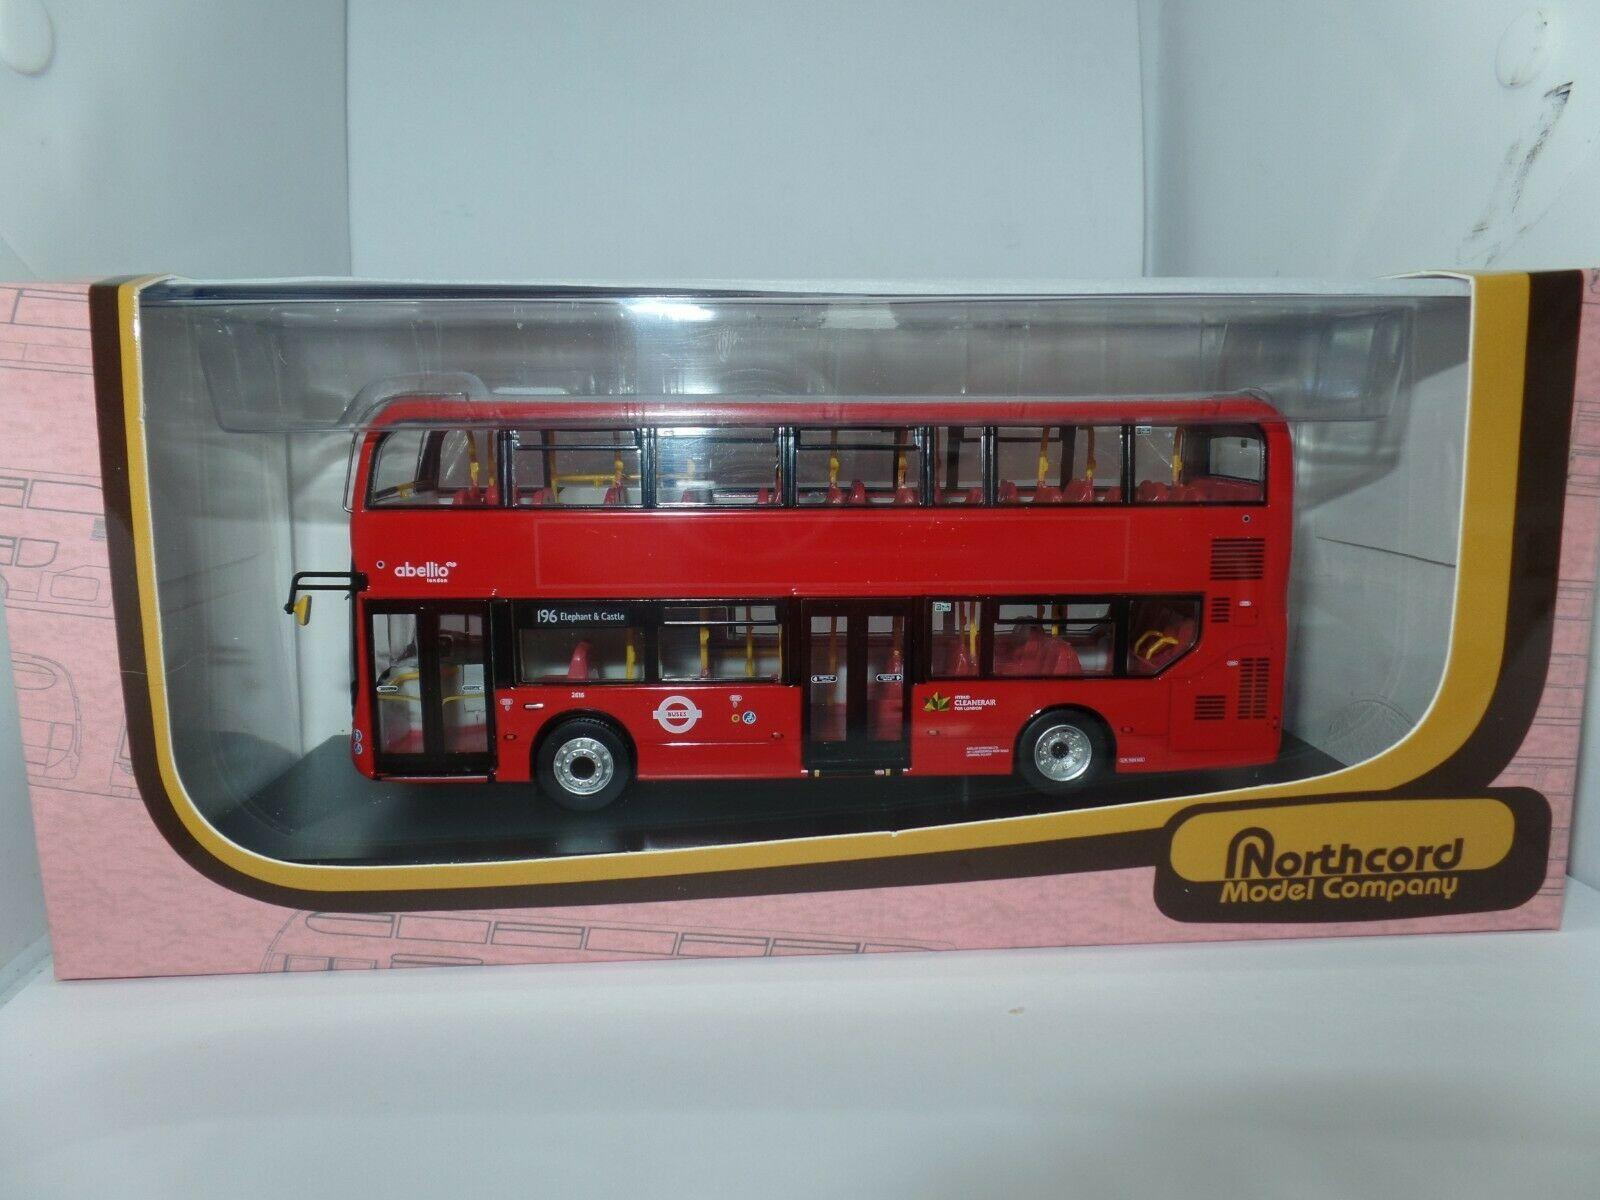 NORTHCORD UKBUS6509 ADL Enviro400MMC Abellio London Transport